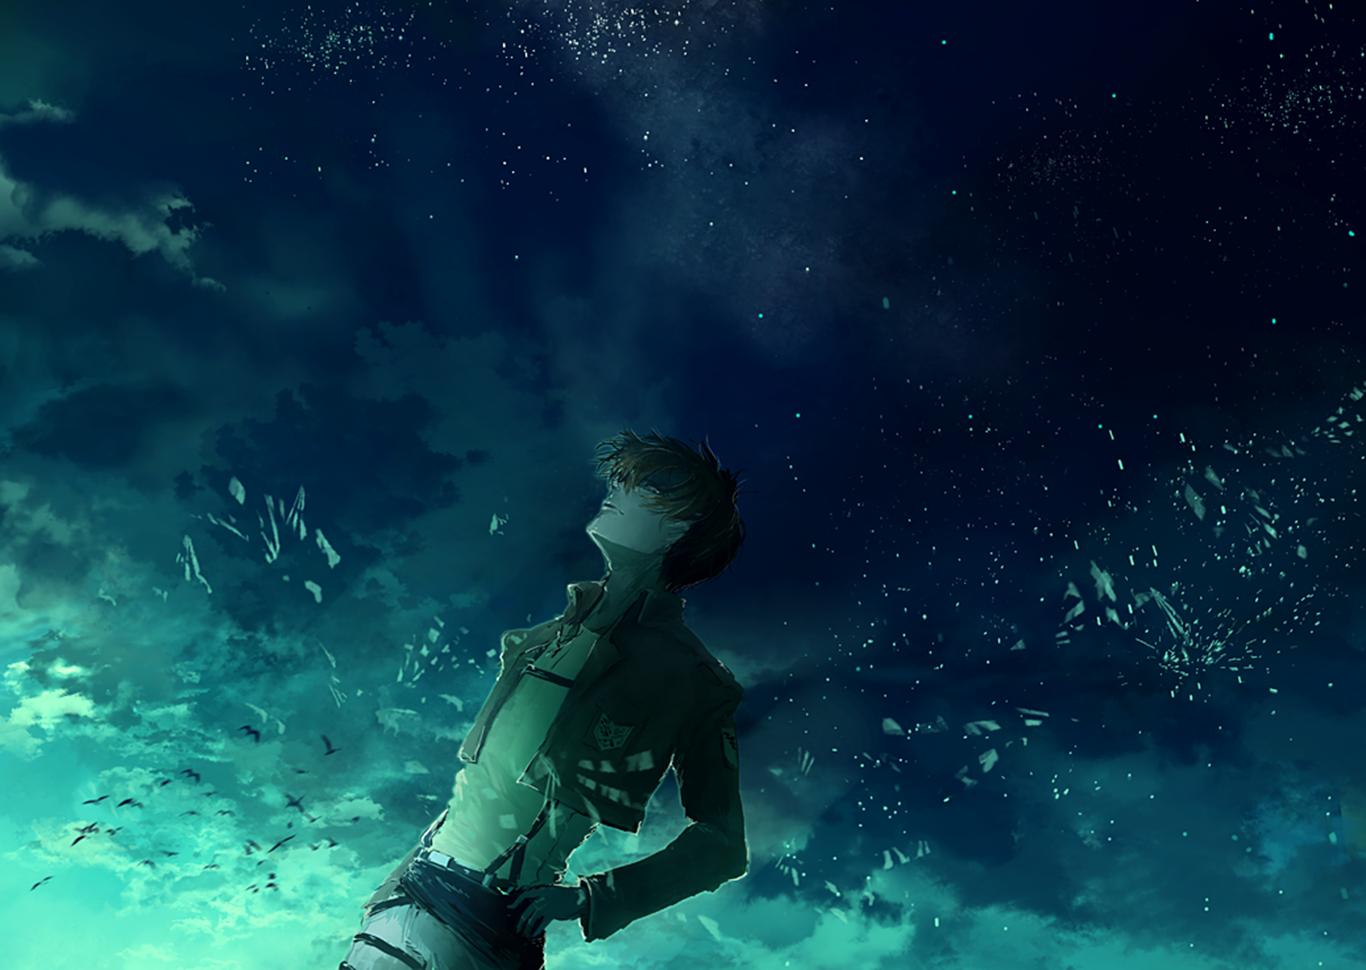 665357 Title Levi Ackerman Anime Attack On Titan Attack On Titan Night Sky 1366x970 Download Hd Wallpaper Wallpapertip